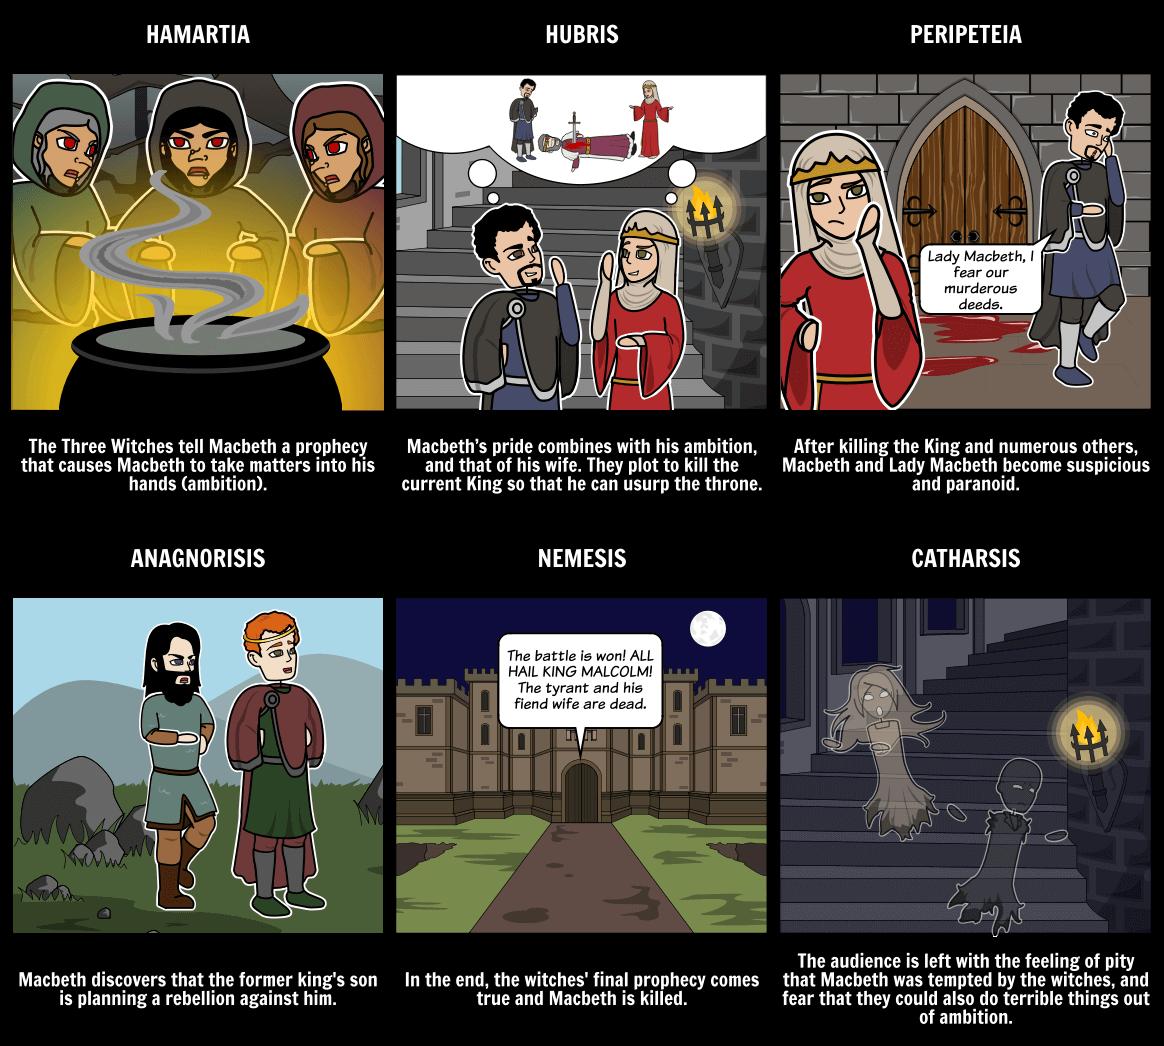 StoryboardThat Digital Storytelling. Use to create